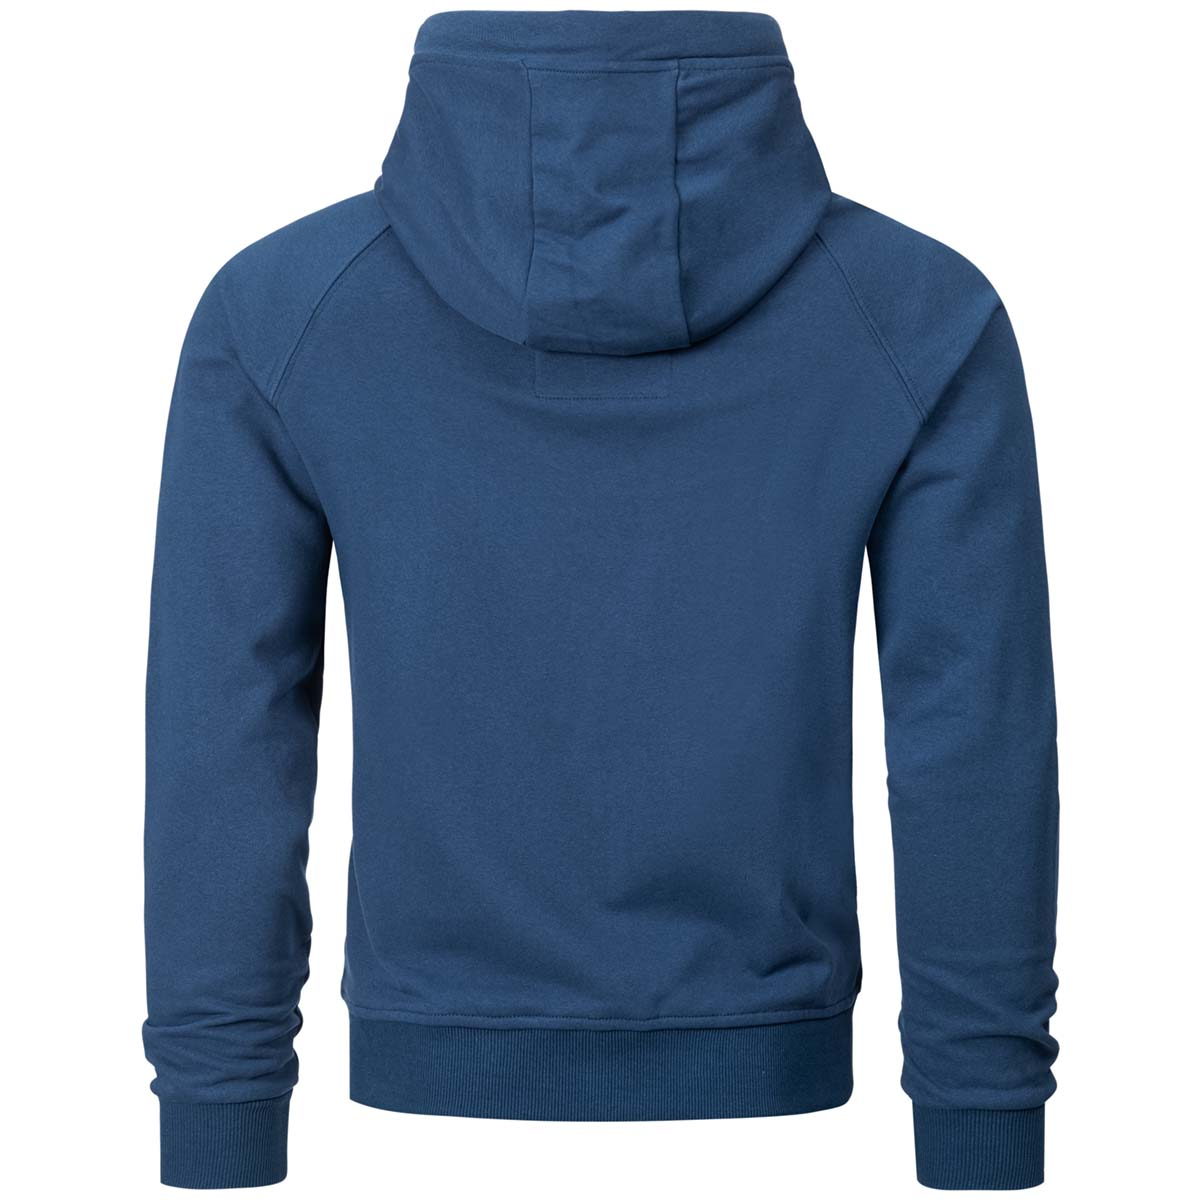 A-Salvarini-Herren-Sweatjacke-Kapuzenpullover-Jacke-Kapuze-Hoodie-Sweater-AS192 Indexbild 35